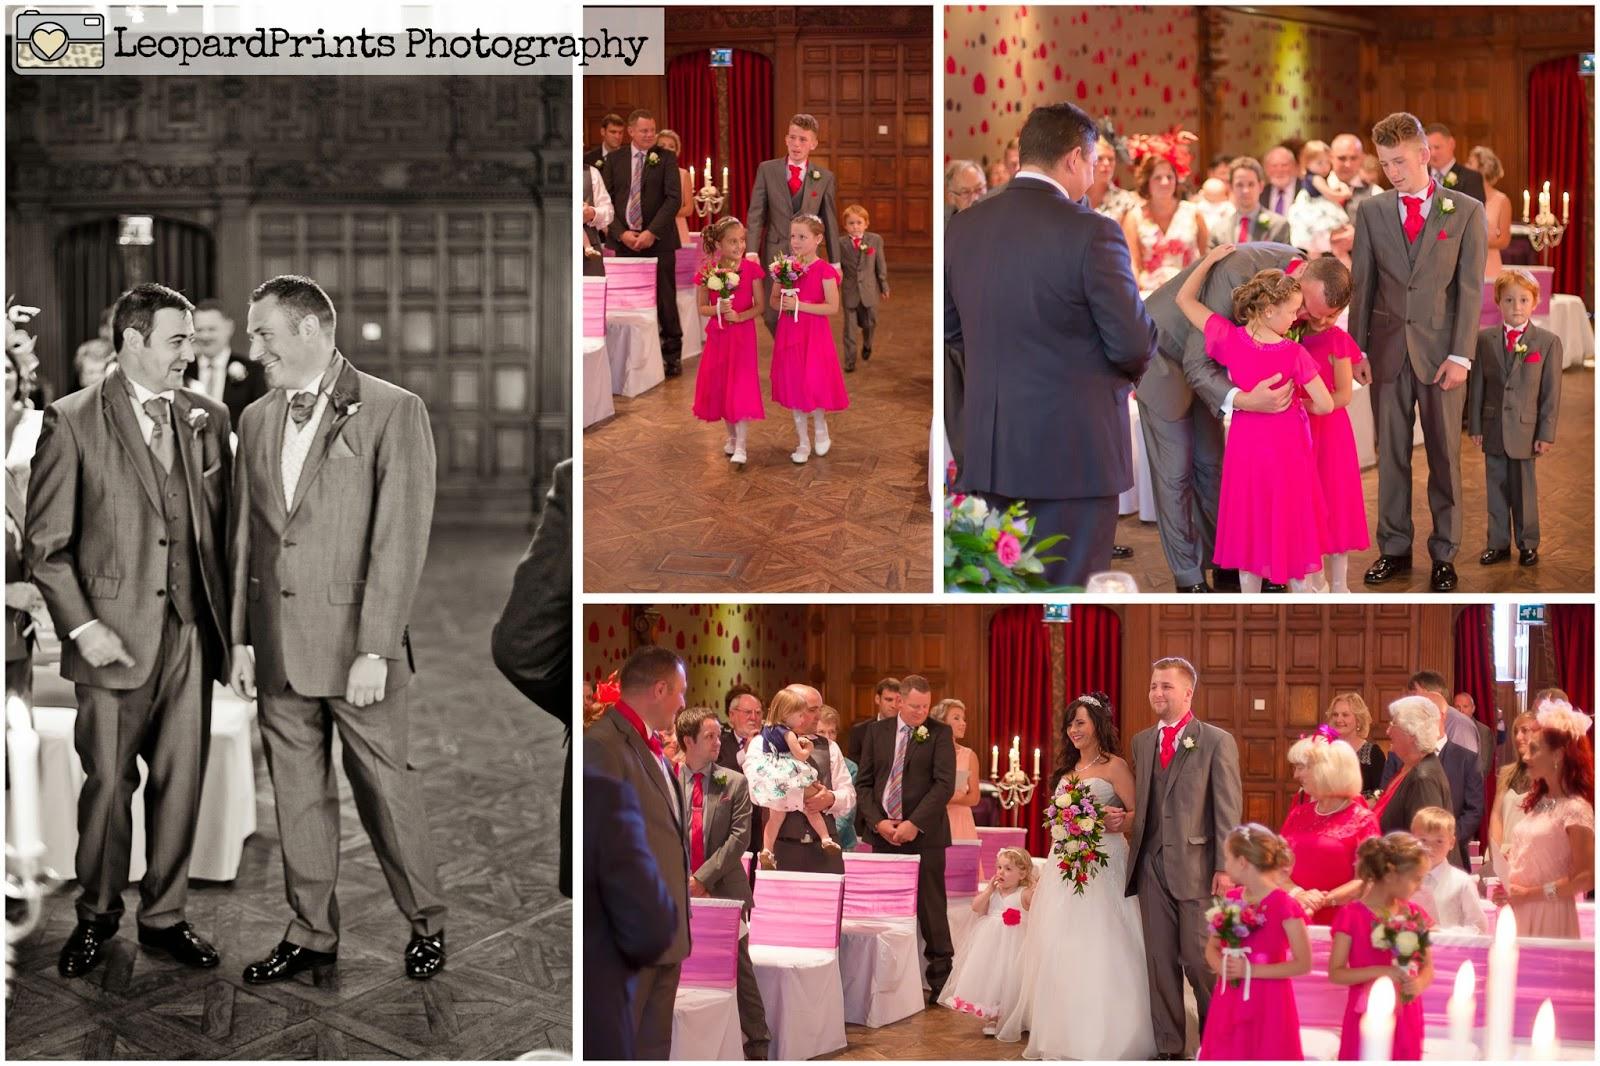 Wedding Chair Covers Newcastle Upon Tyne No Sew For Folding Chairs Leopardprints Weddings: Photographer At Jesmond Dene House